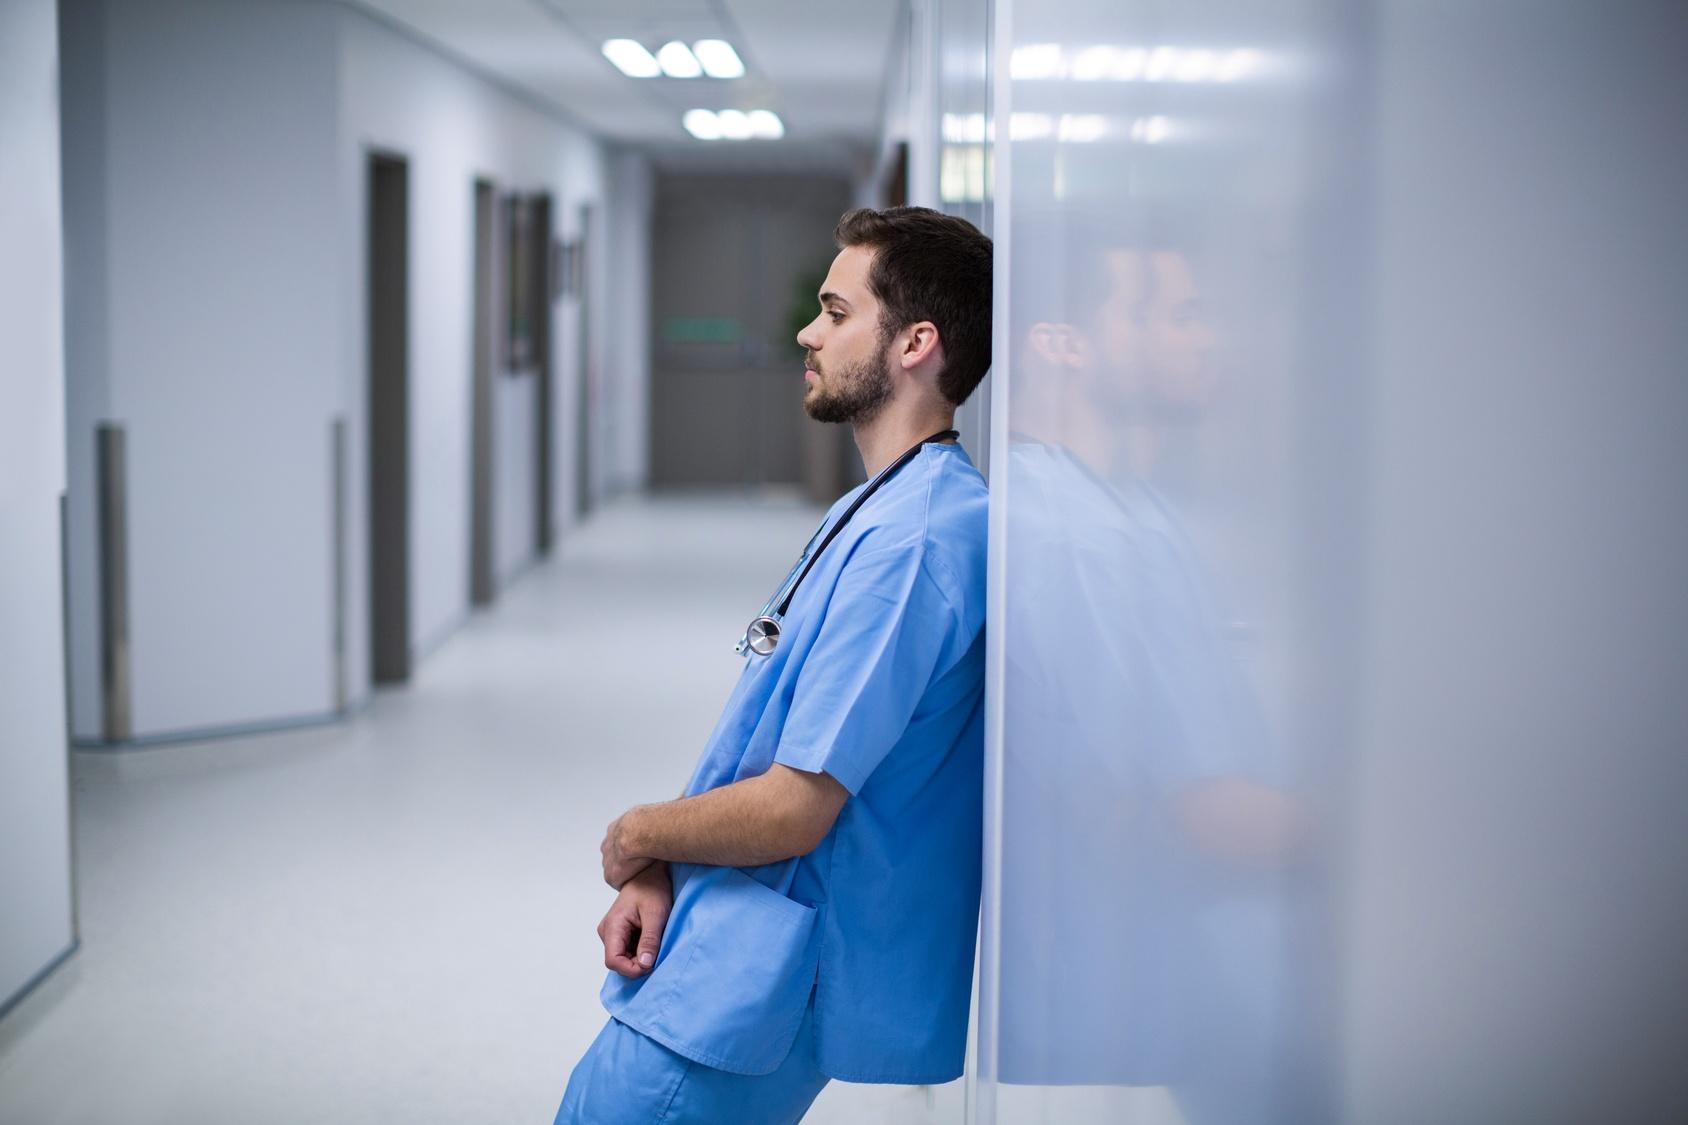 Gestresster Krankenpfleger